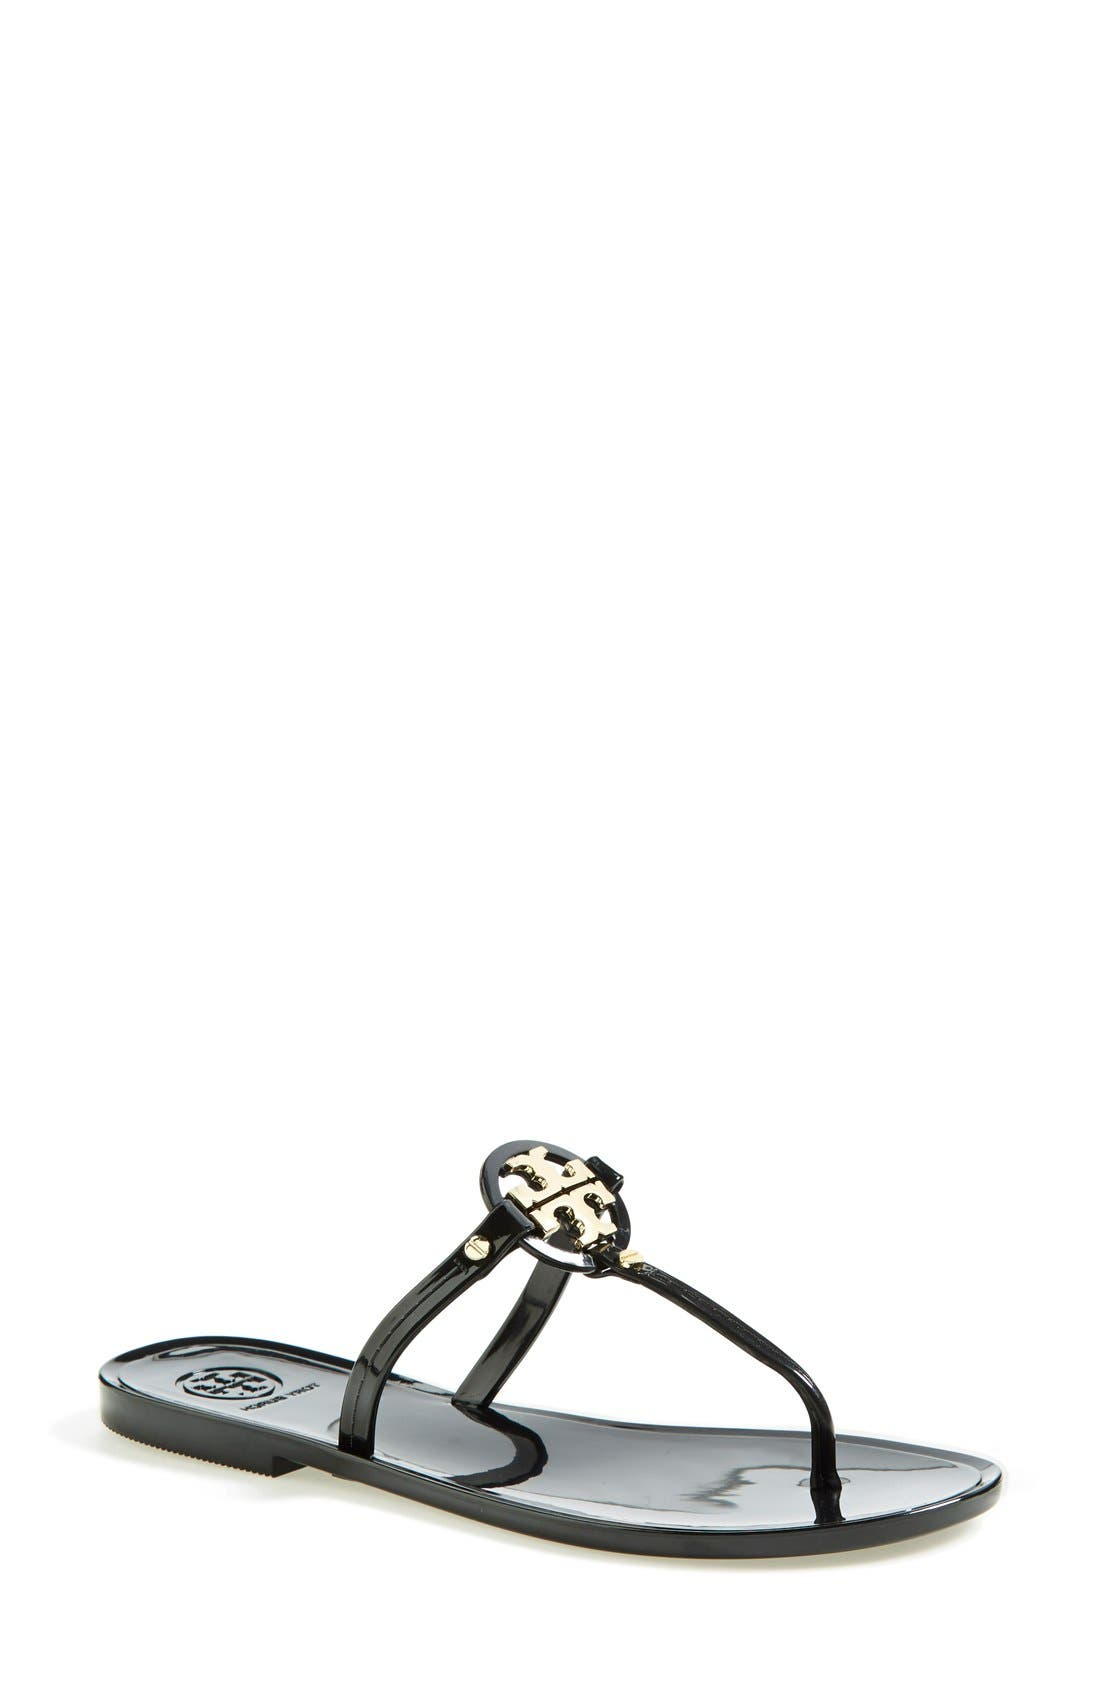 Alternate Image 1 Selected - Tory Burch 'Mini Miller' Flat Sandal (Women)